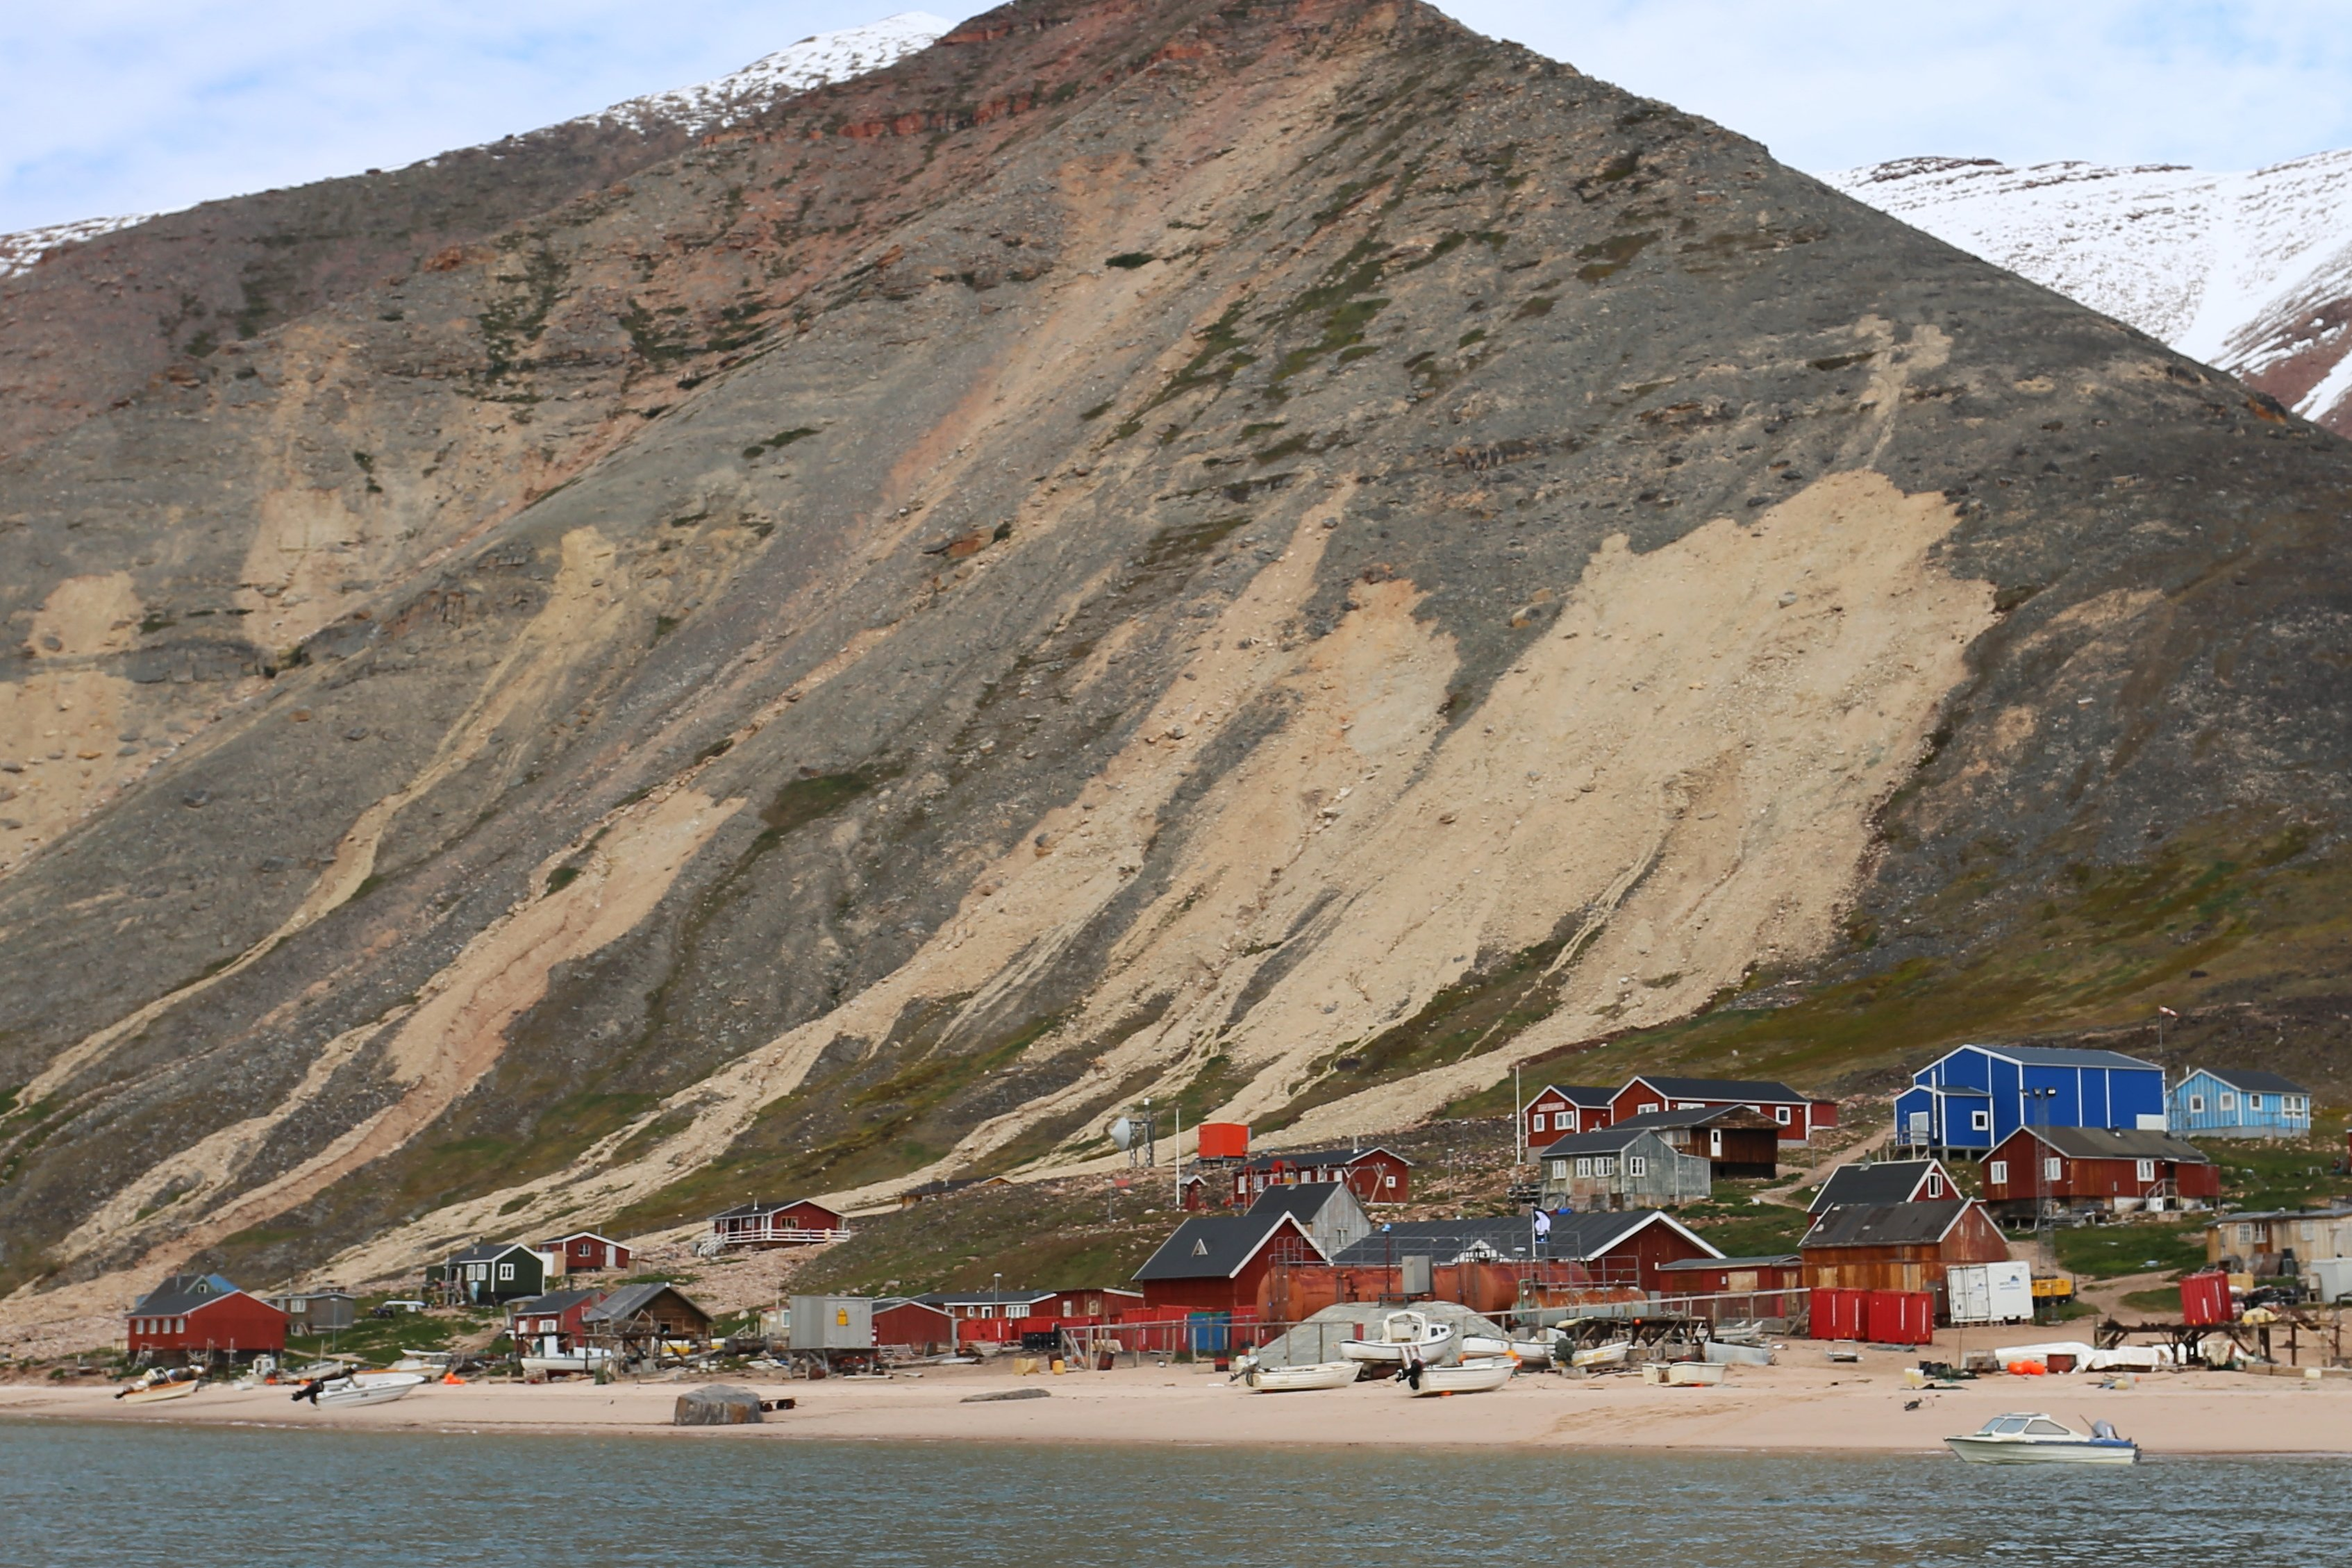 Landslides in Siorapaluk, Greenland's northernmost settlement